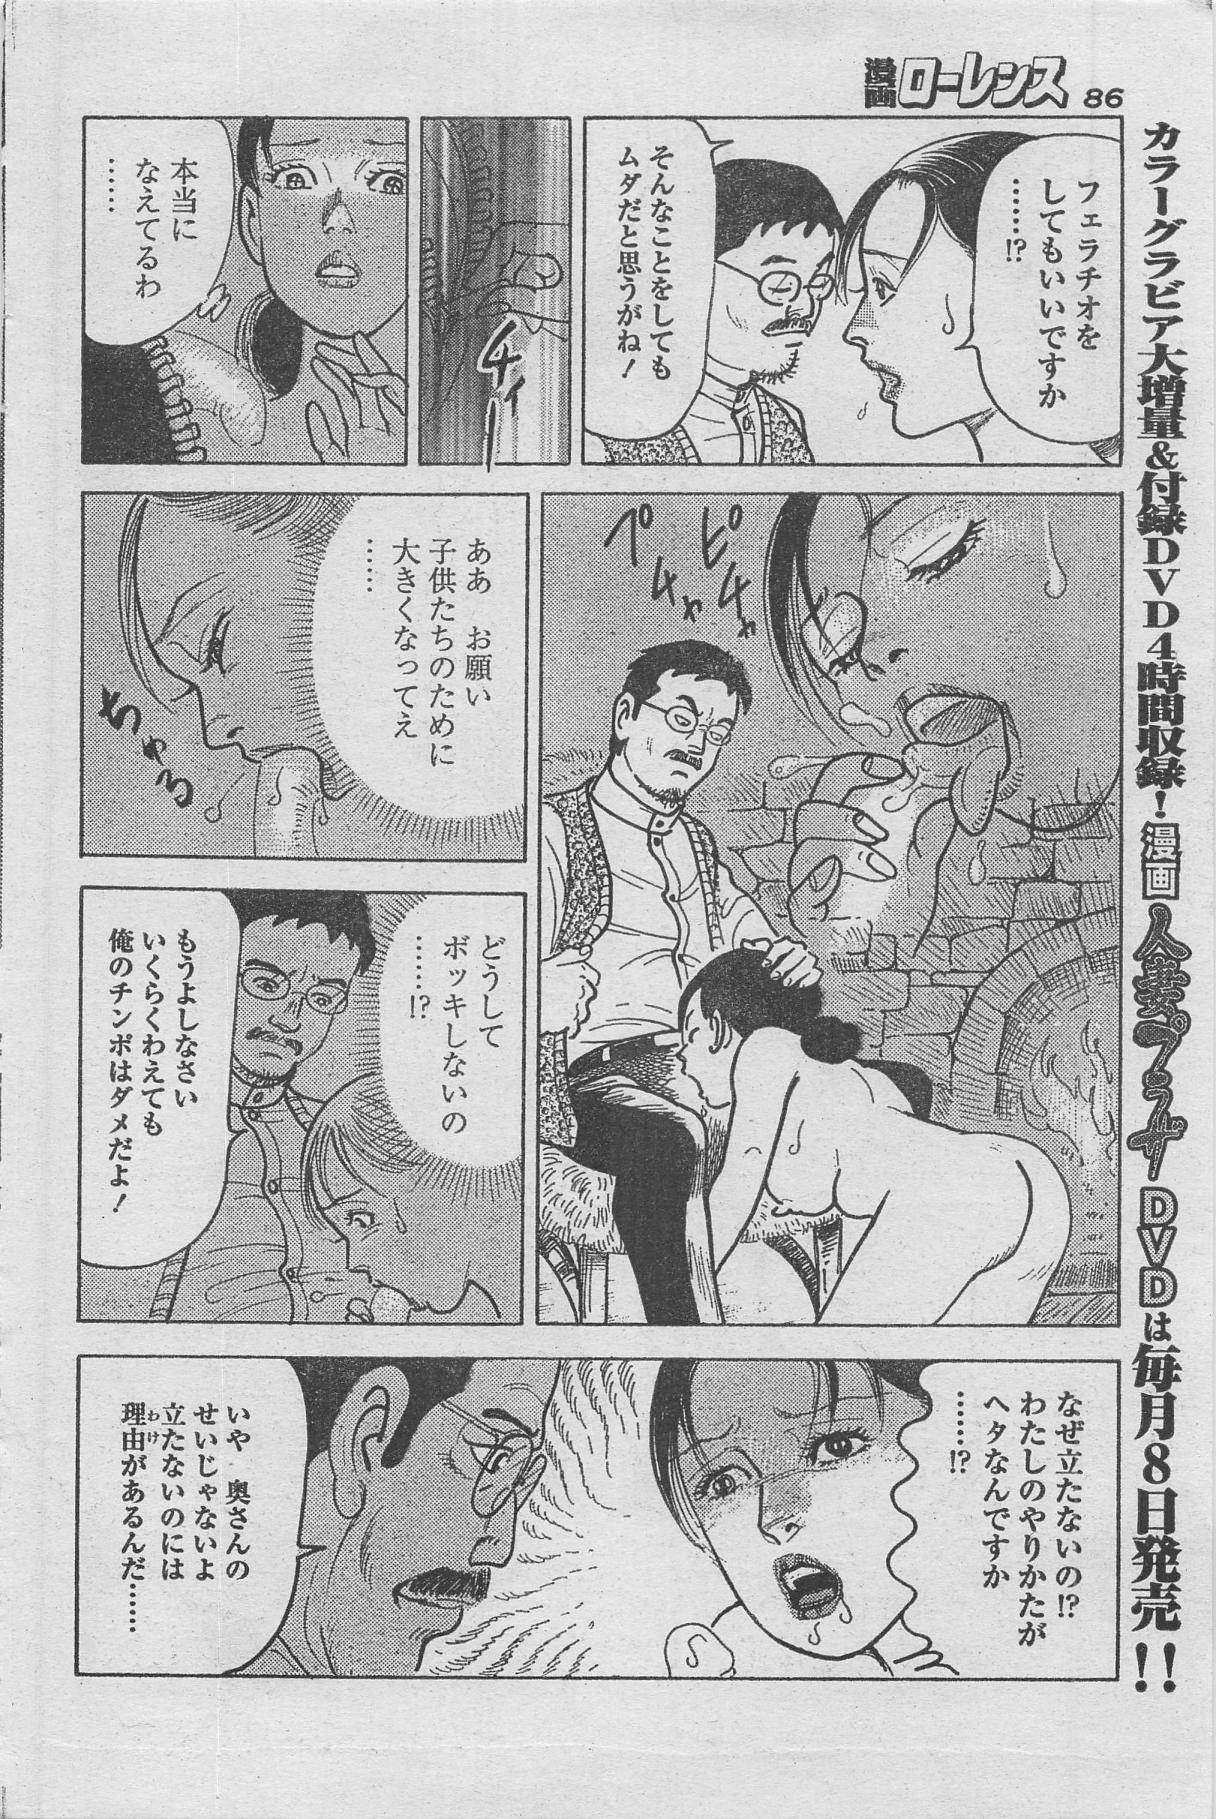 Manga Lawrence 2013-04 73